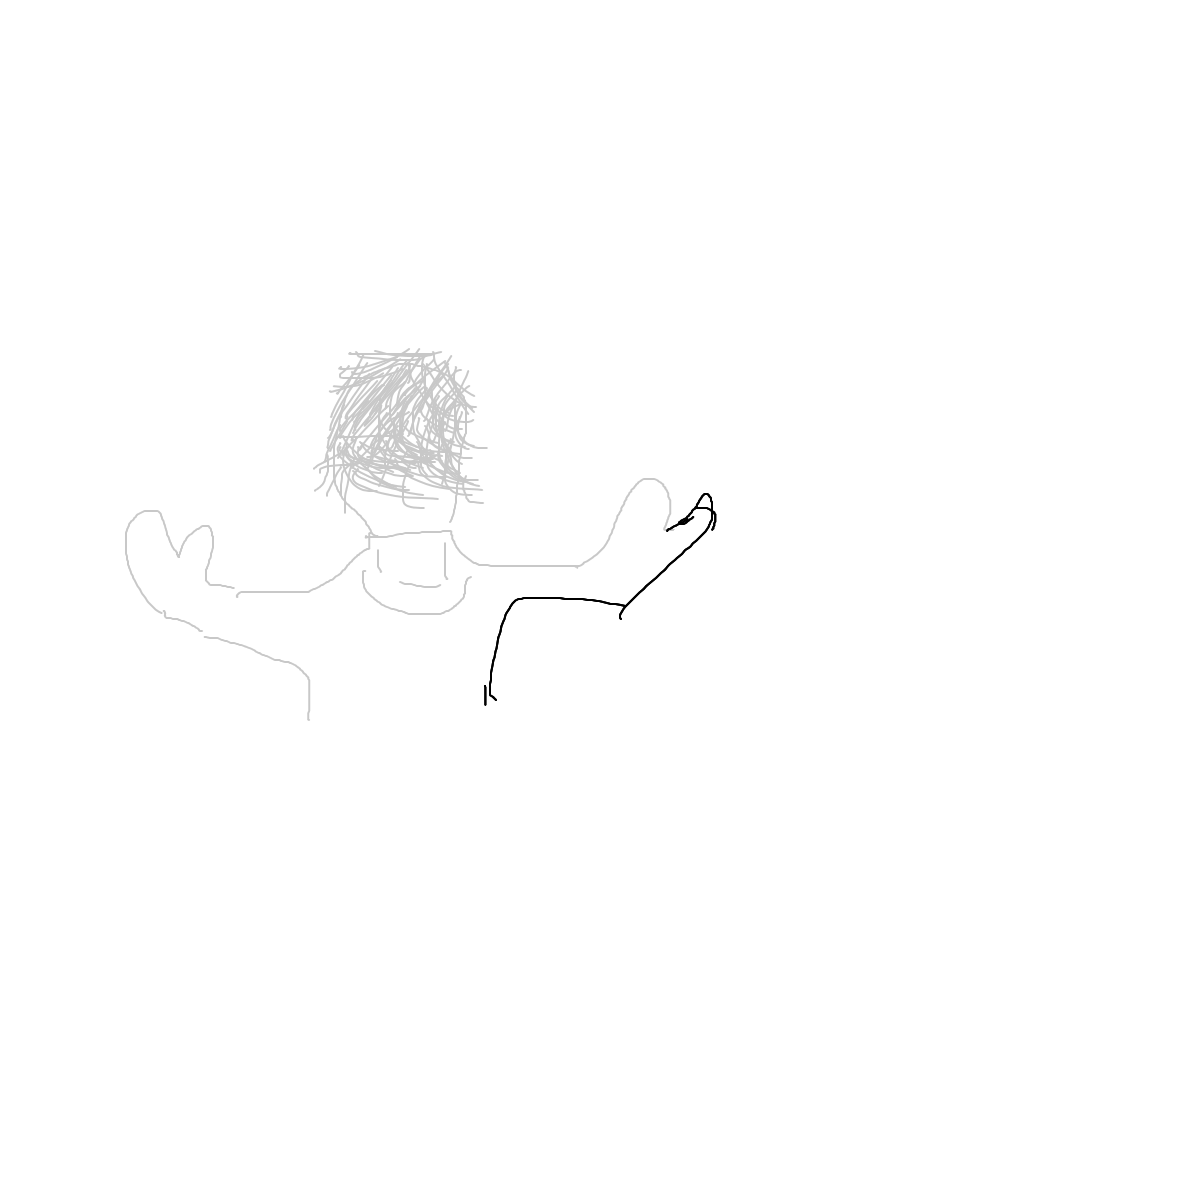 BAAAM drawing#5257 lat:39.9655952453613300lng: -75.1809082031250000